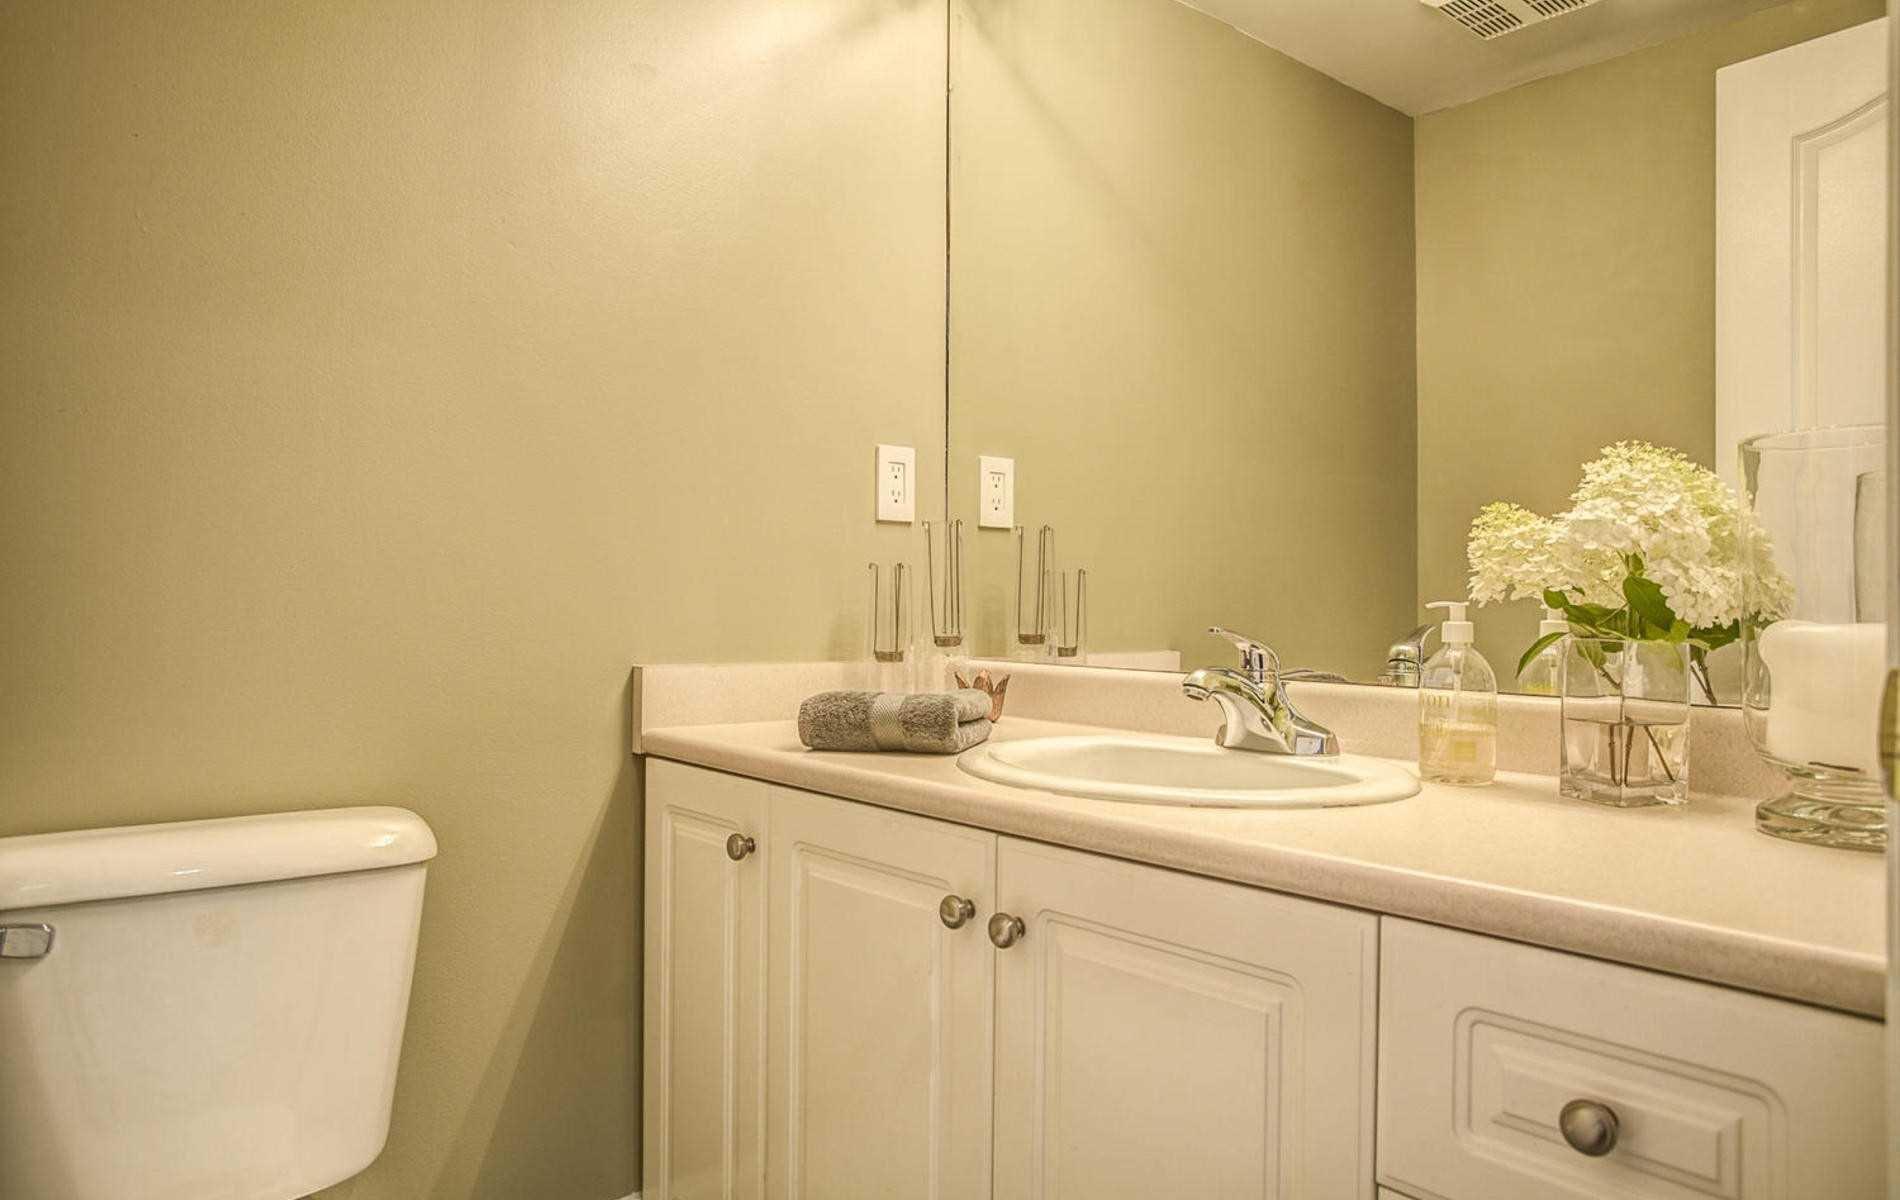 Photo 5: Photos: 119 Carlaw Avenue in Toronto: South Riverdale House (3-Storey) for lease (Toronto E01)  : MLS®# E4386176